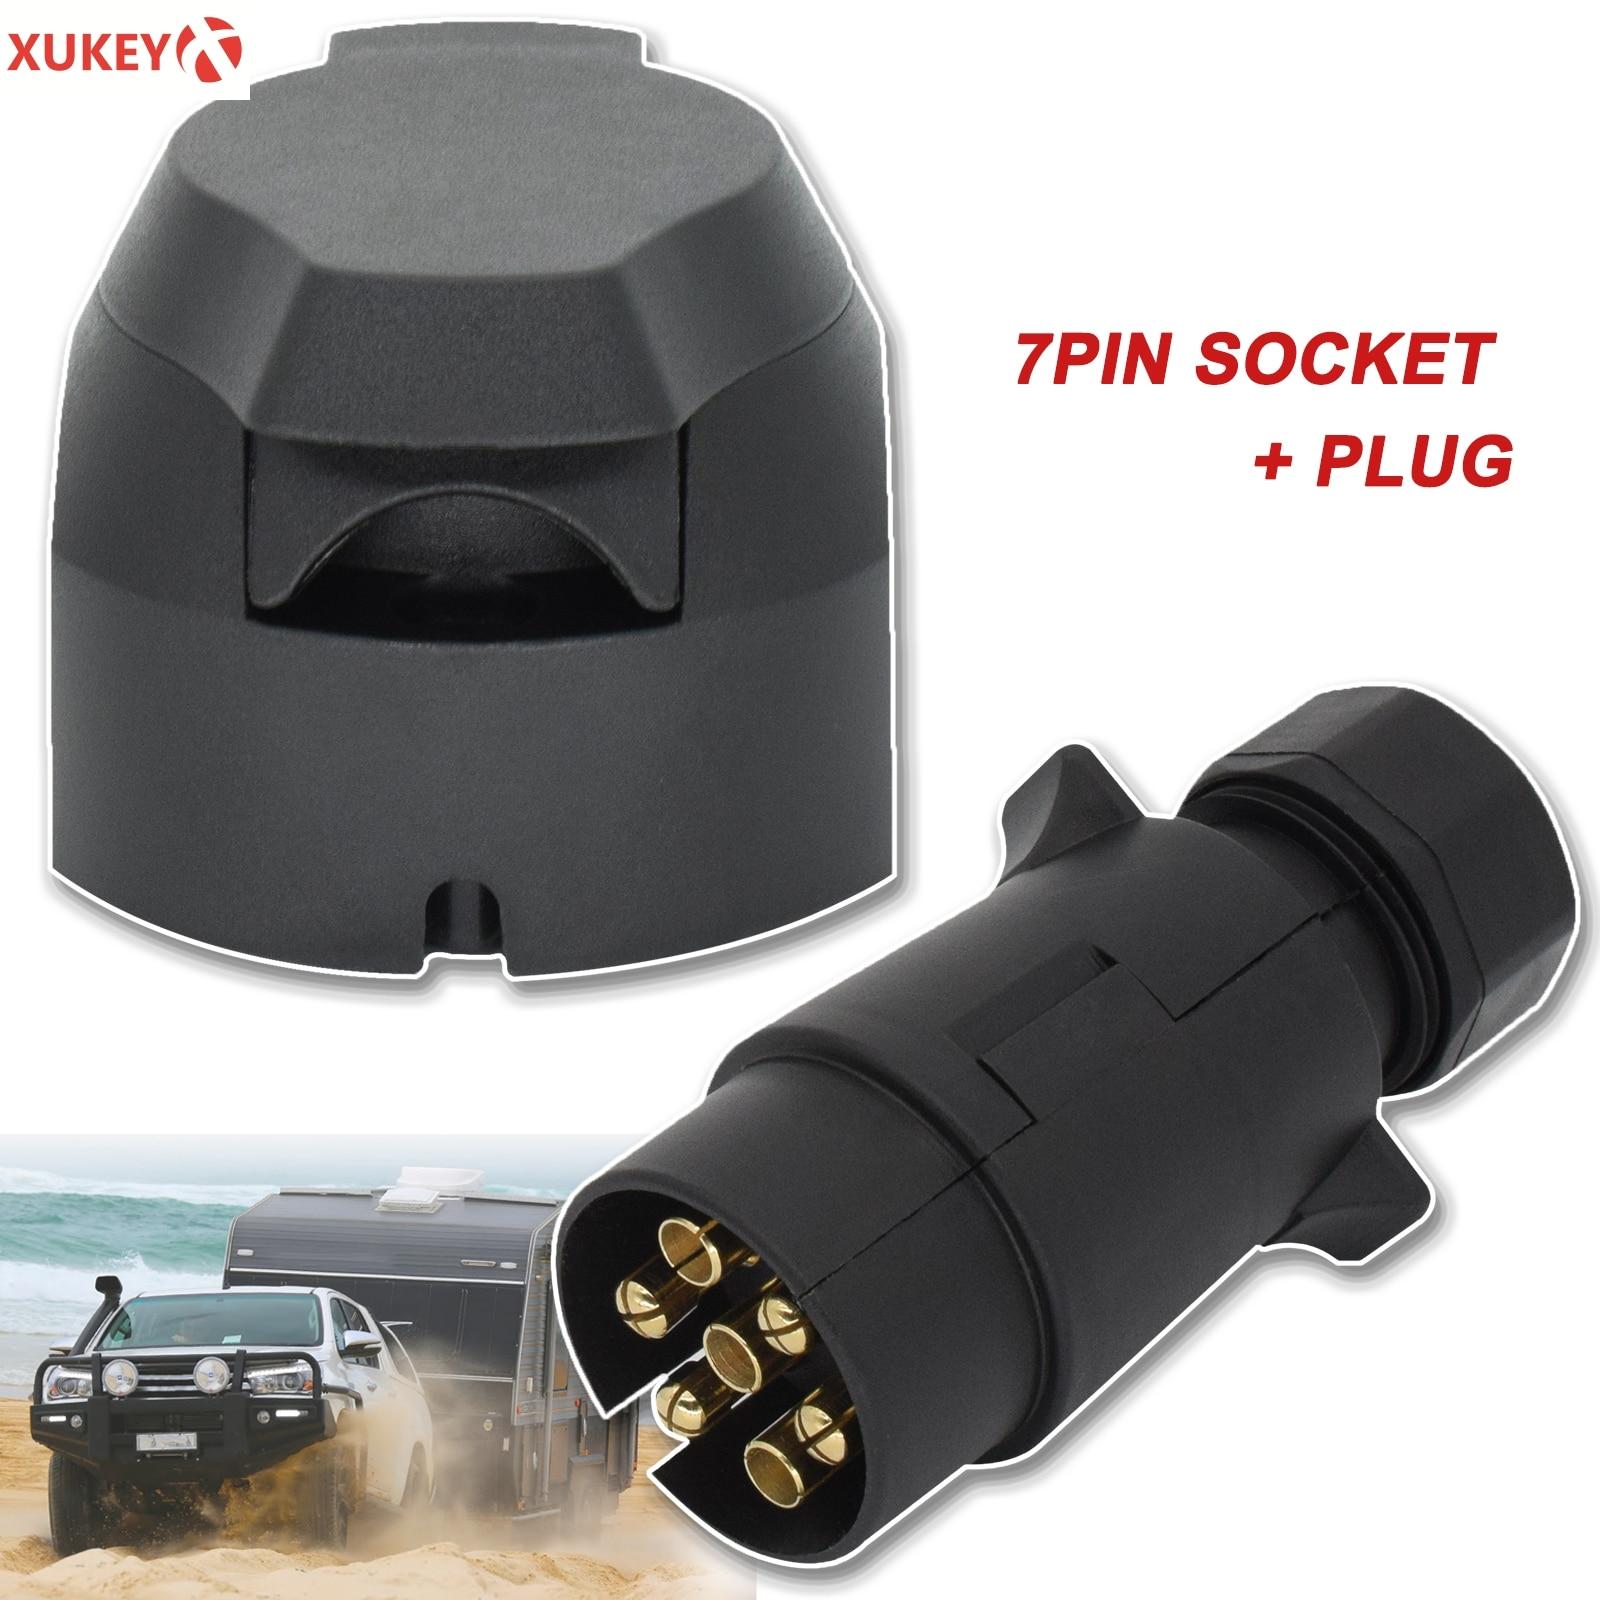 7 Pin 12V European Trailer Socket + Plug Tow Bar Electrics Connector Adapter For RV Truck Vans Caravans Transfer Signal Adapter